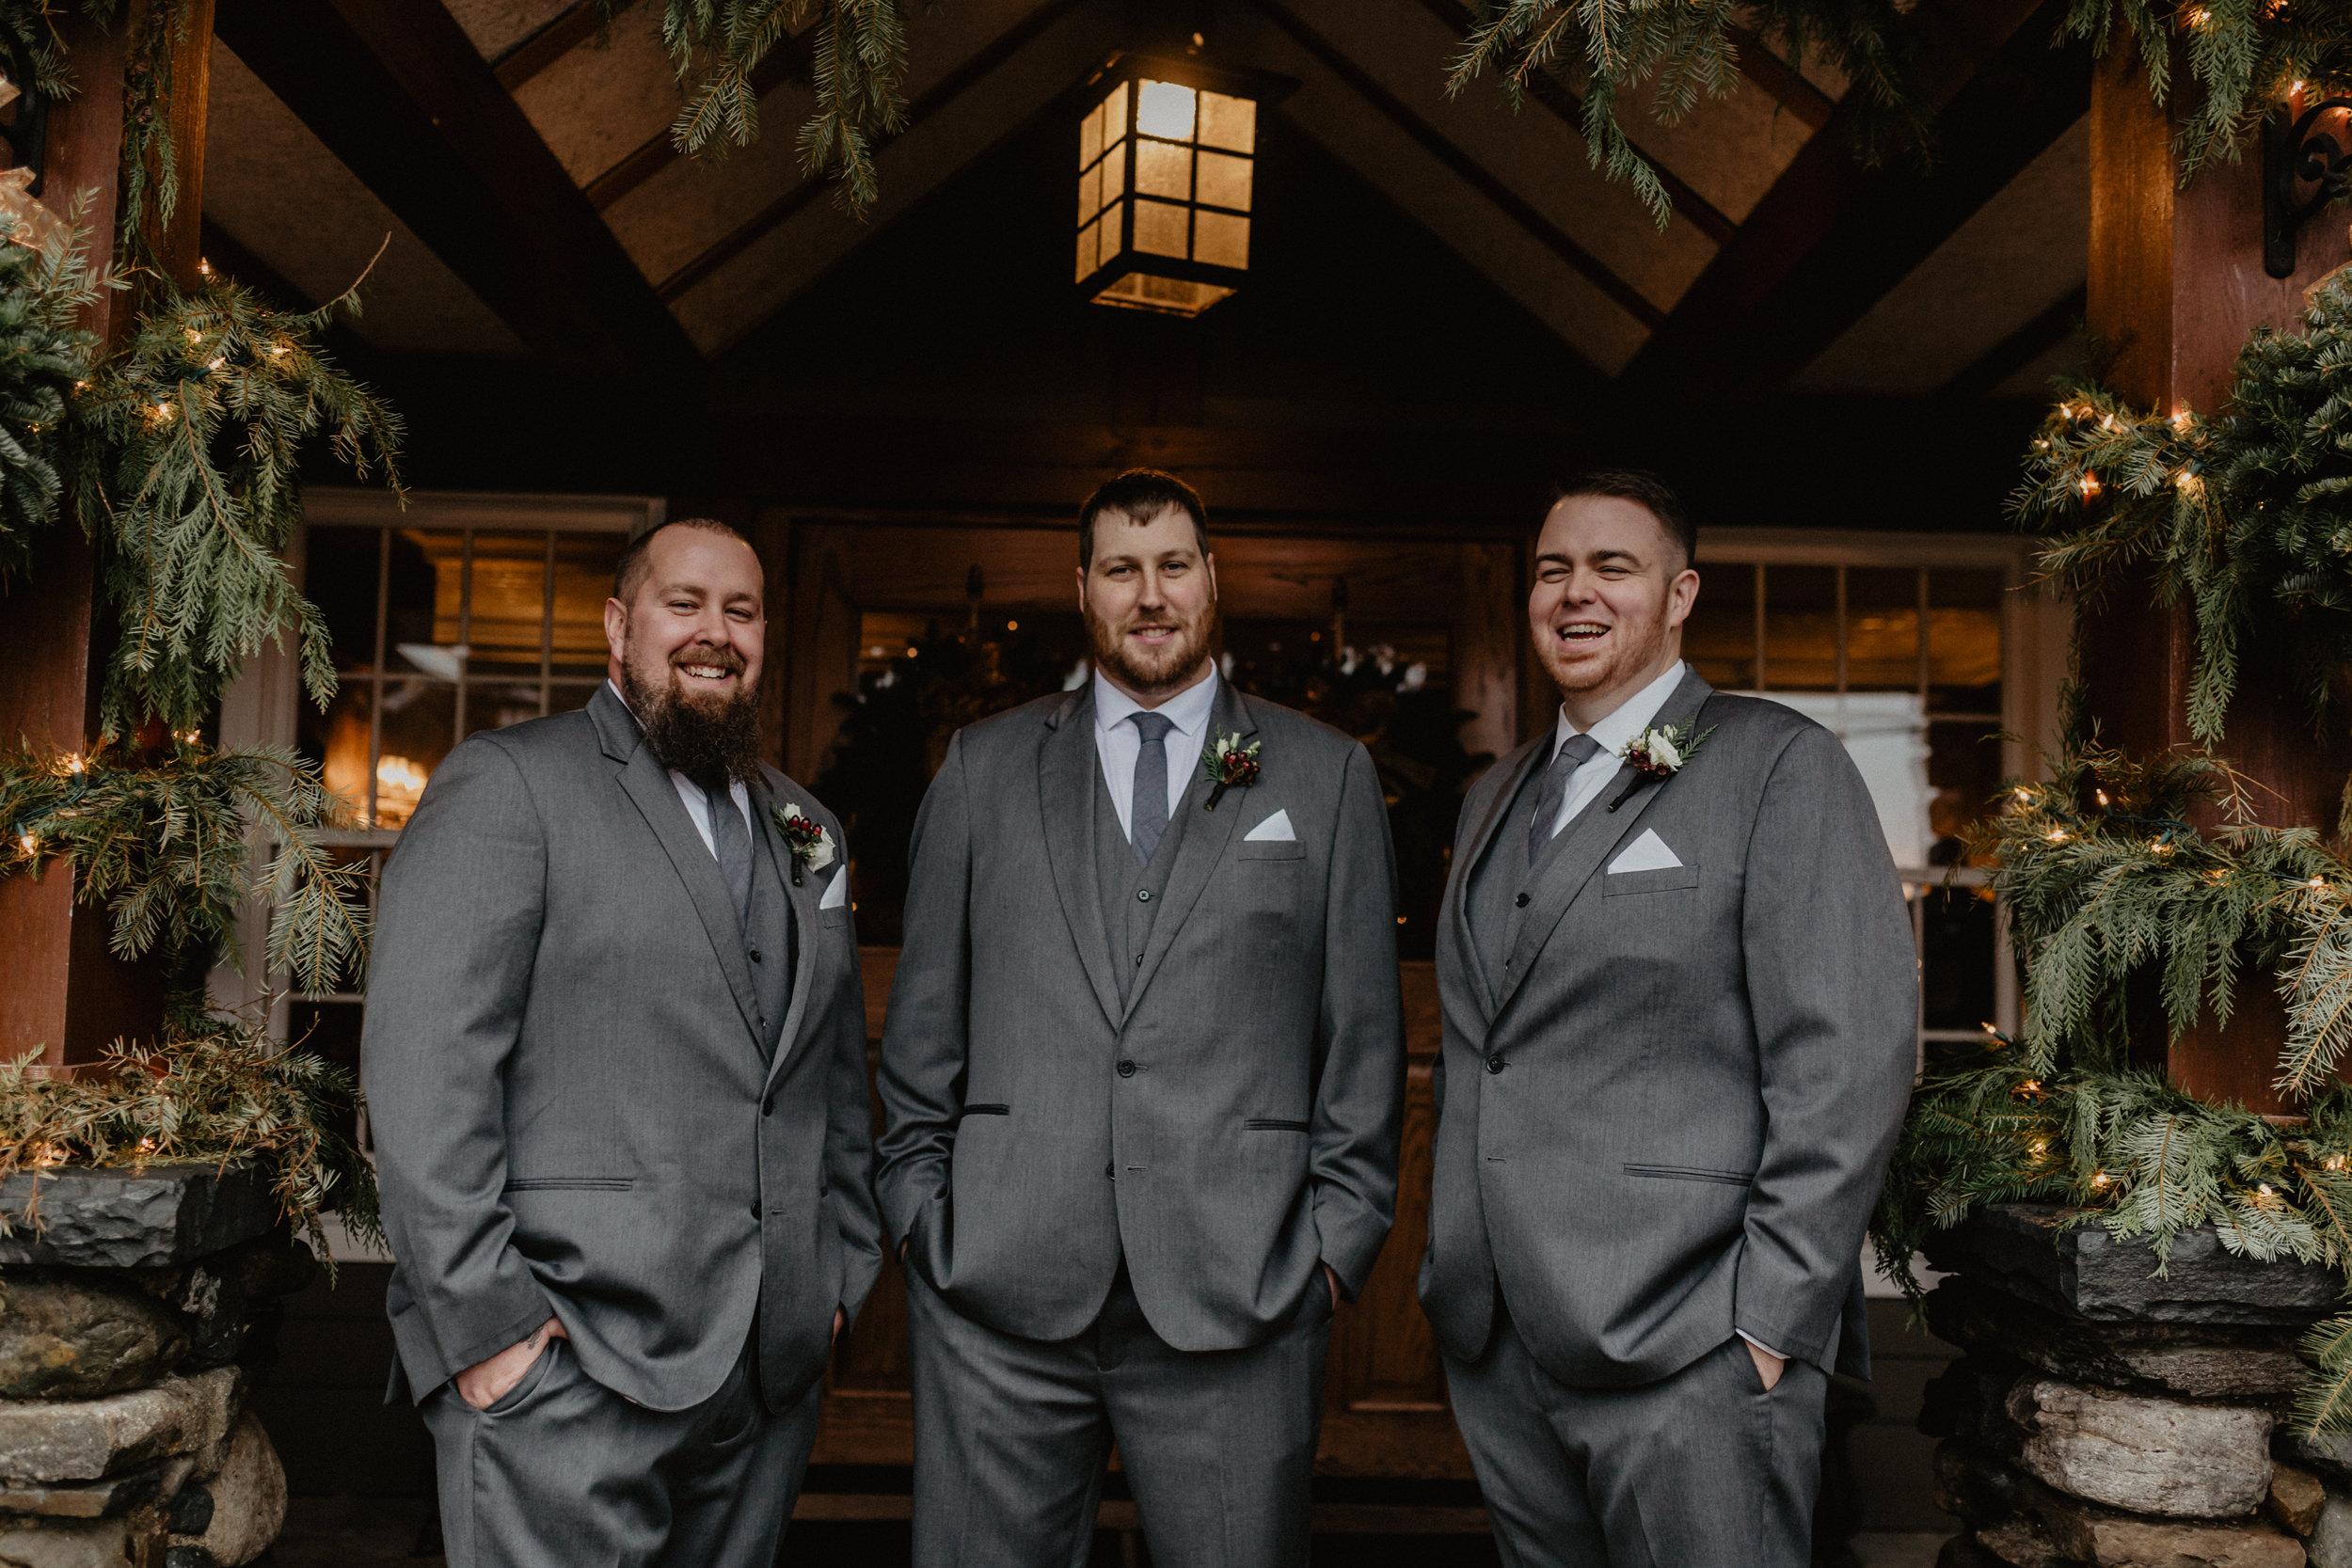 old_daley_on_crooked_lake_wedding_039.jpg